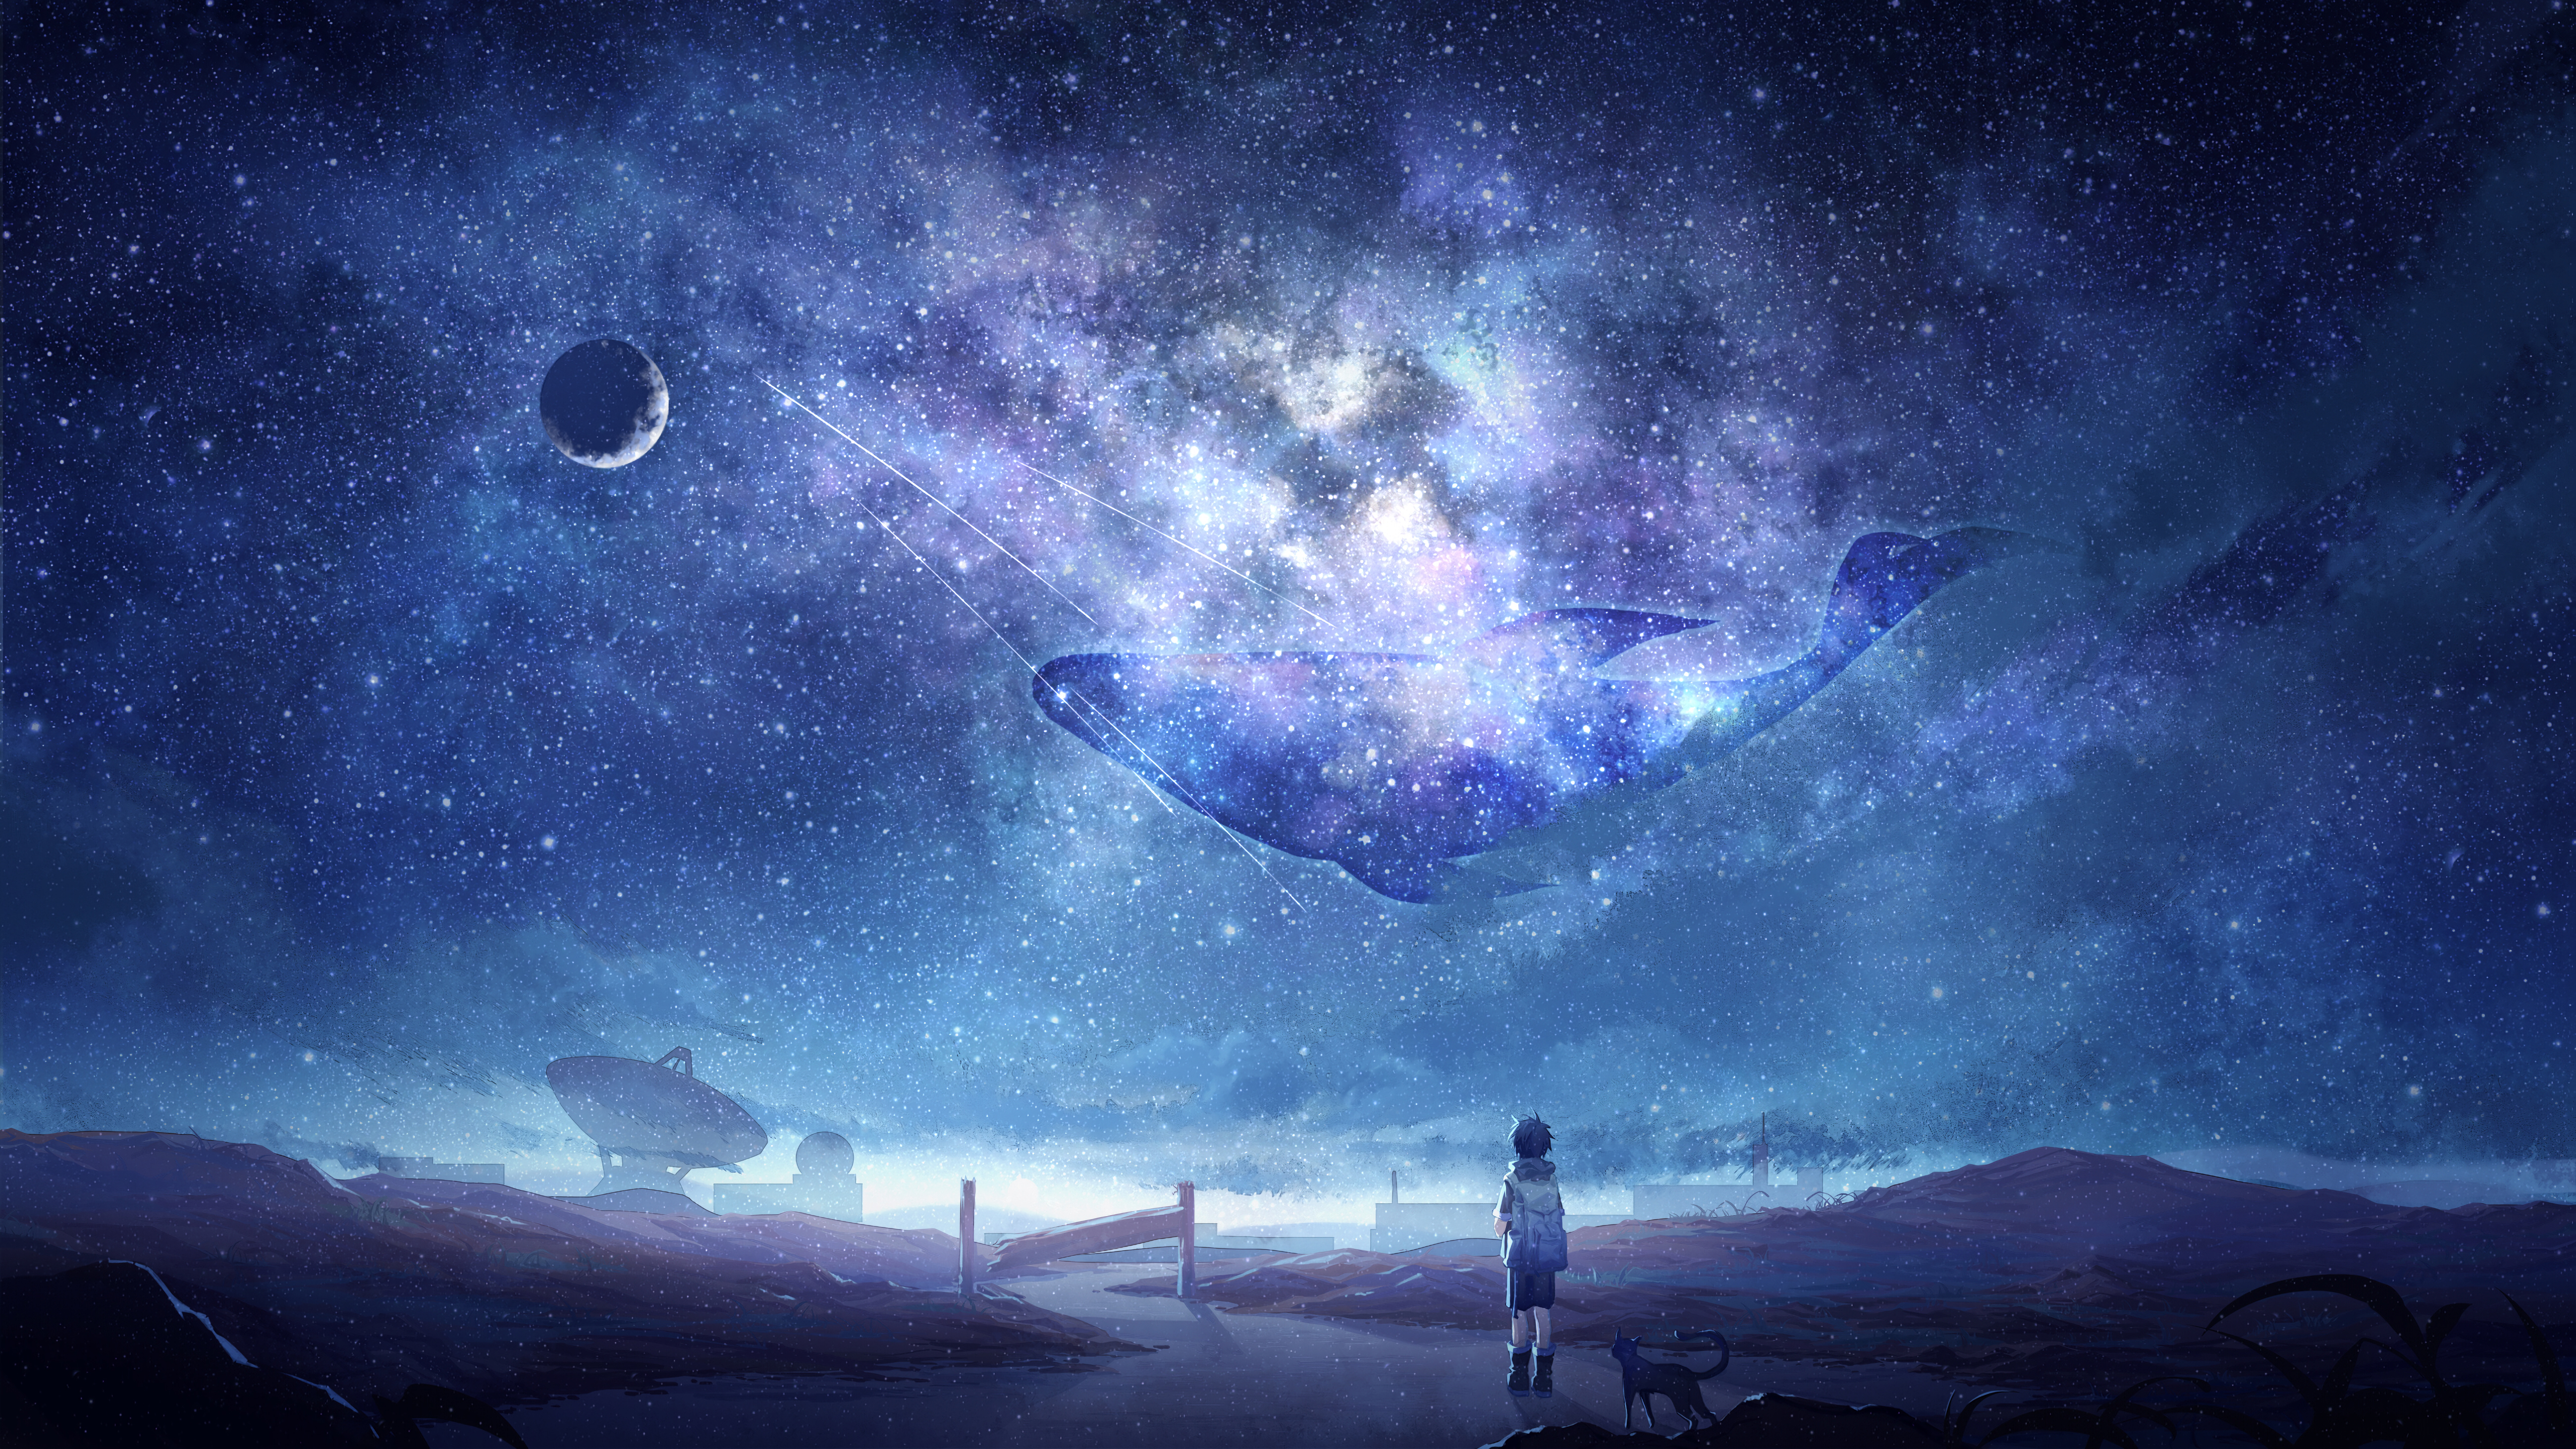 Wallpaper 4k Anime Fantasy Sky